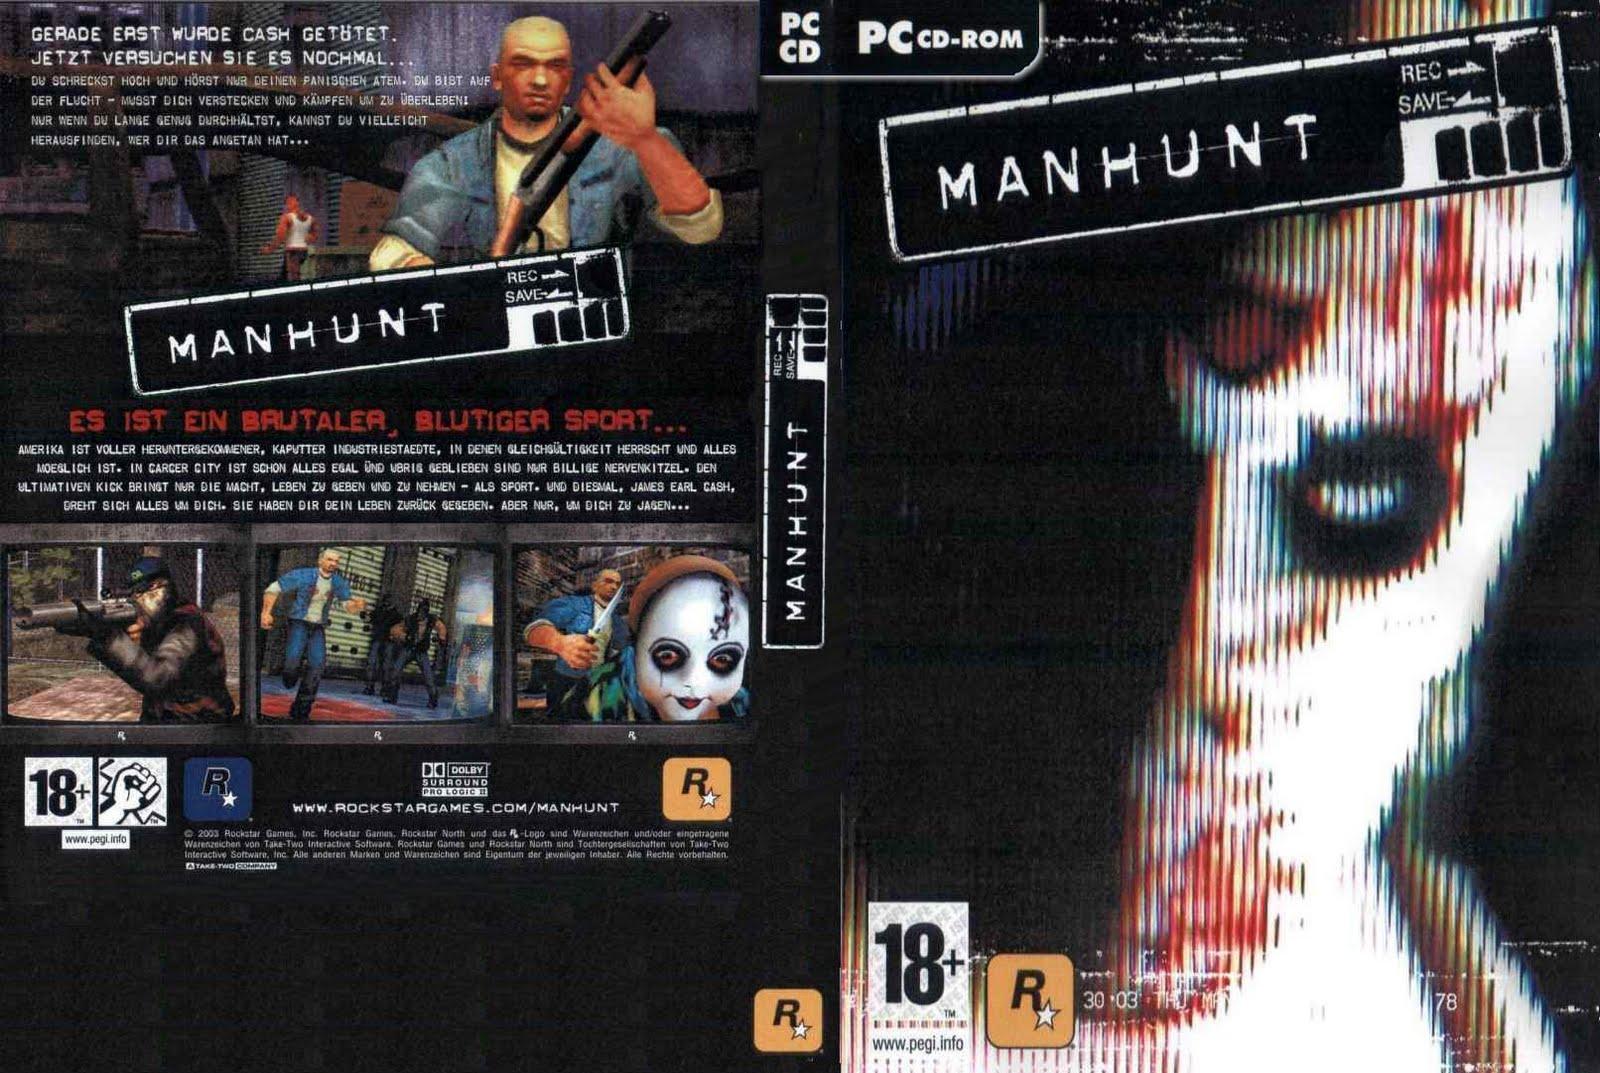 Manhunt__PC_FULL.jpg